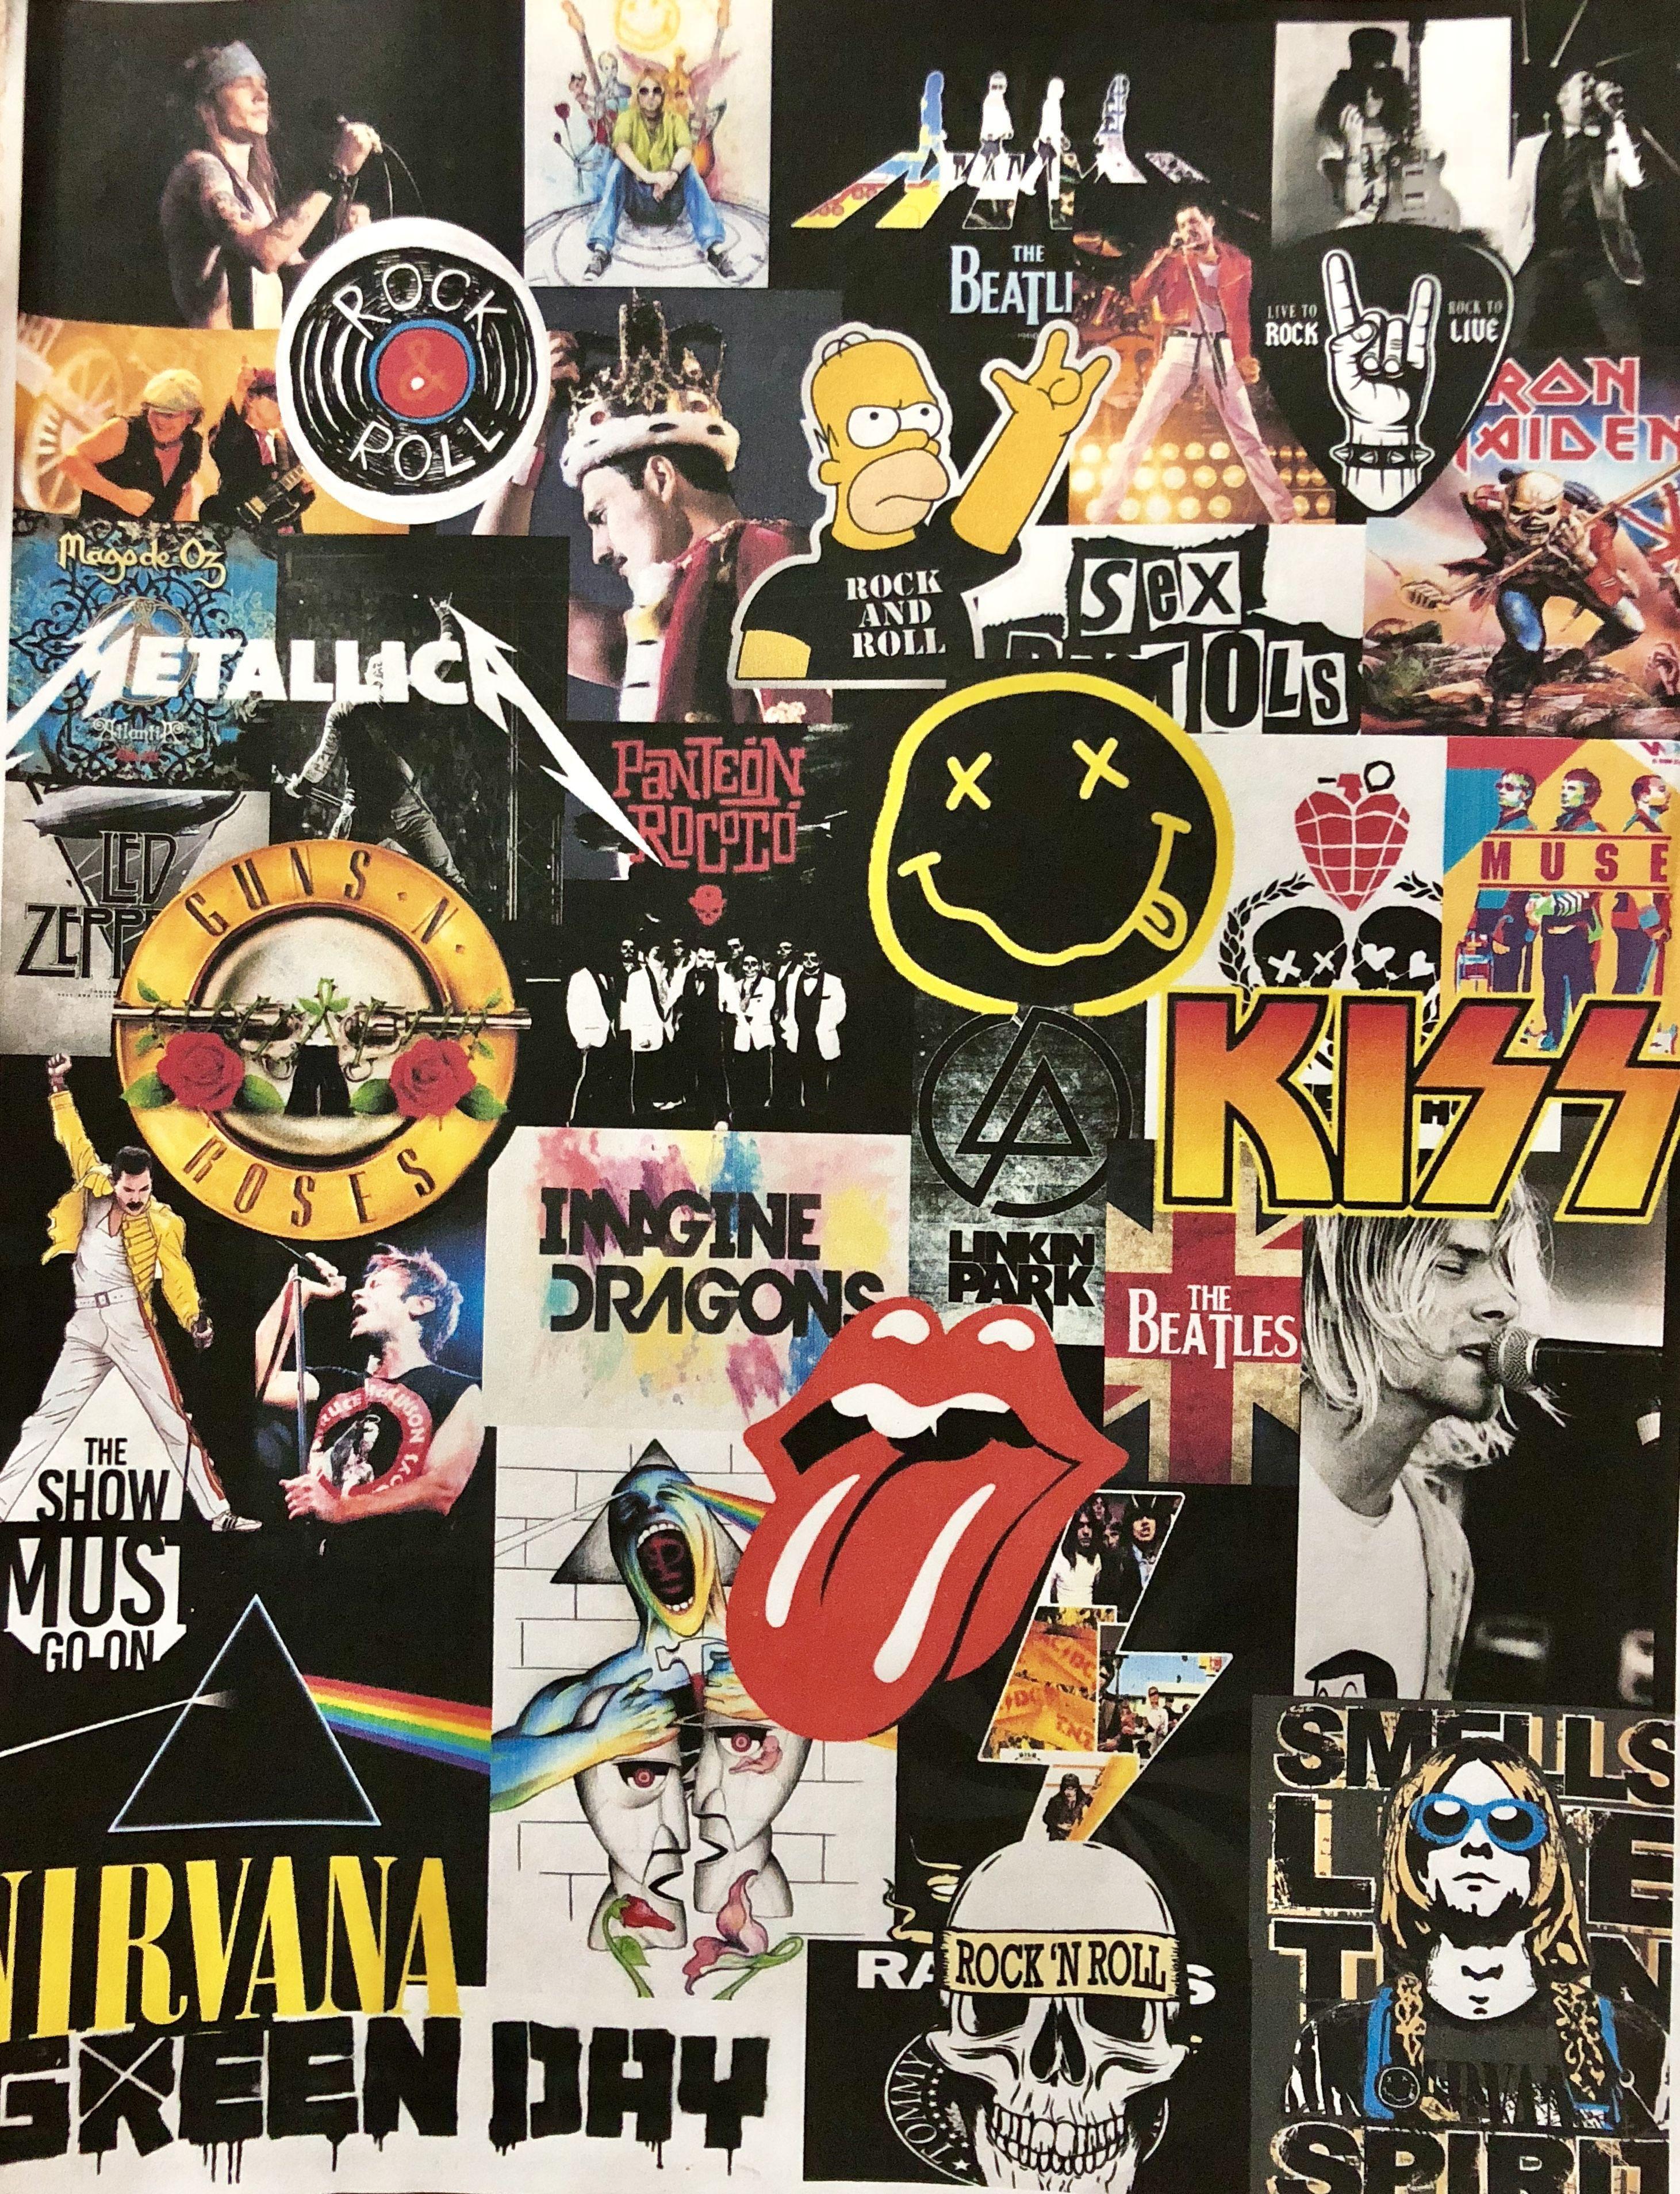 Rock Wallpaper Iphone : wallpaper, iphone, IPhone, Wallpapers, Backgrounds, WallpaperAccess